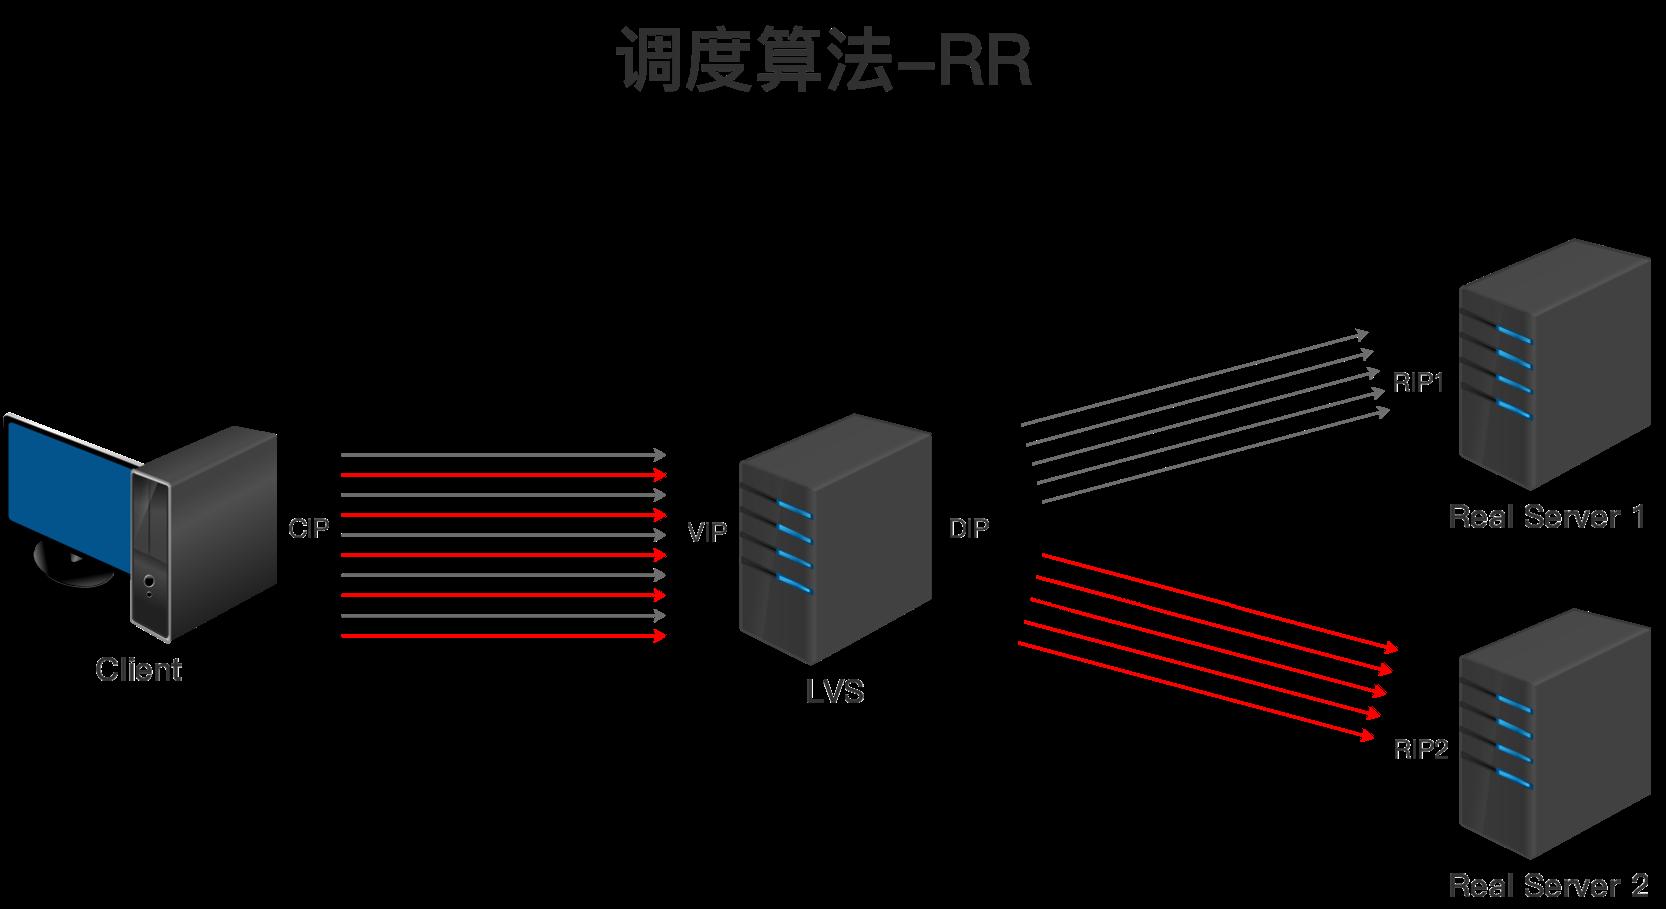 LVS调度算法-RR.png